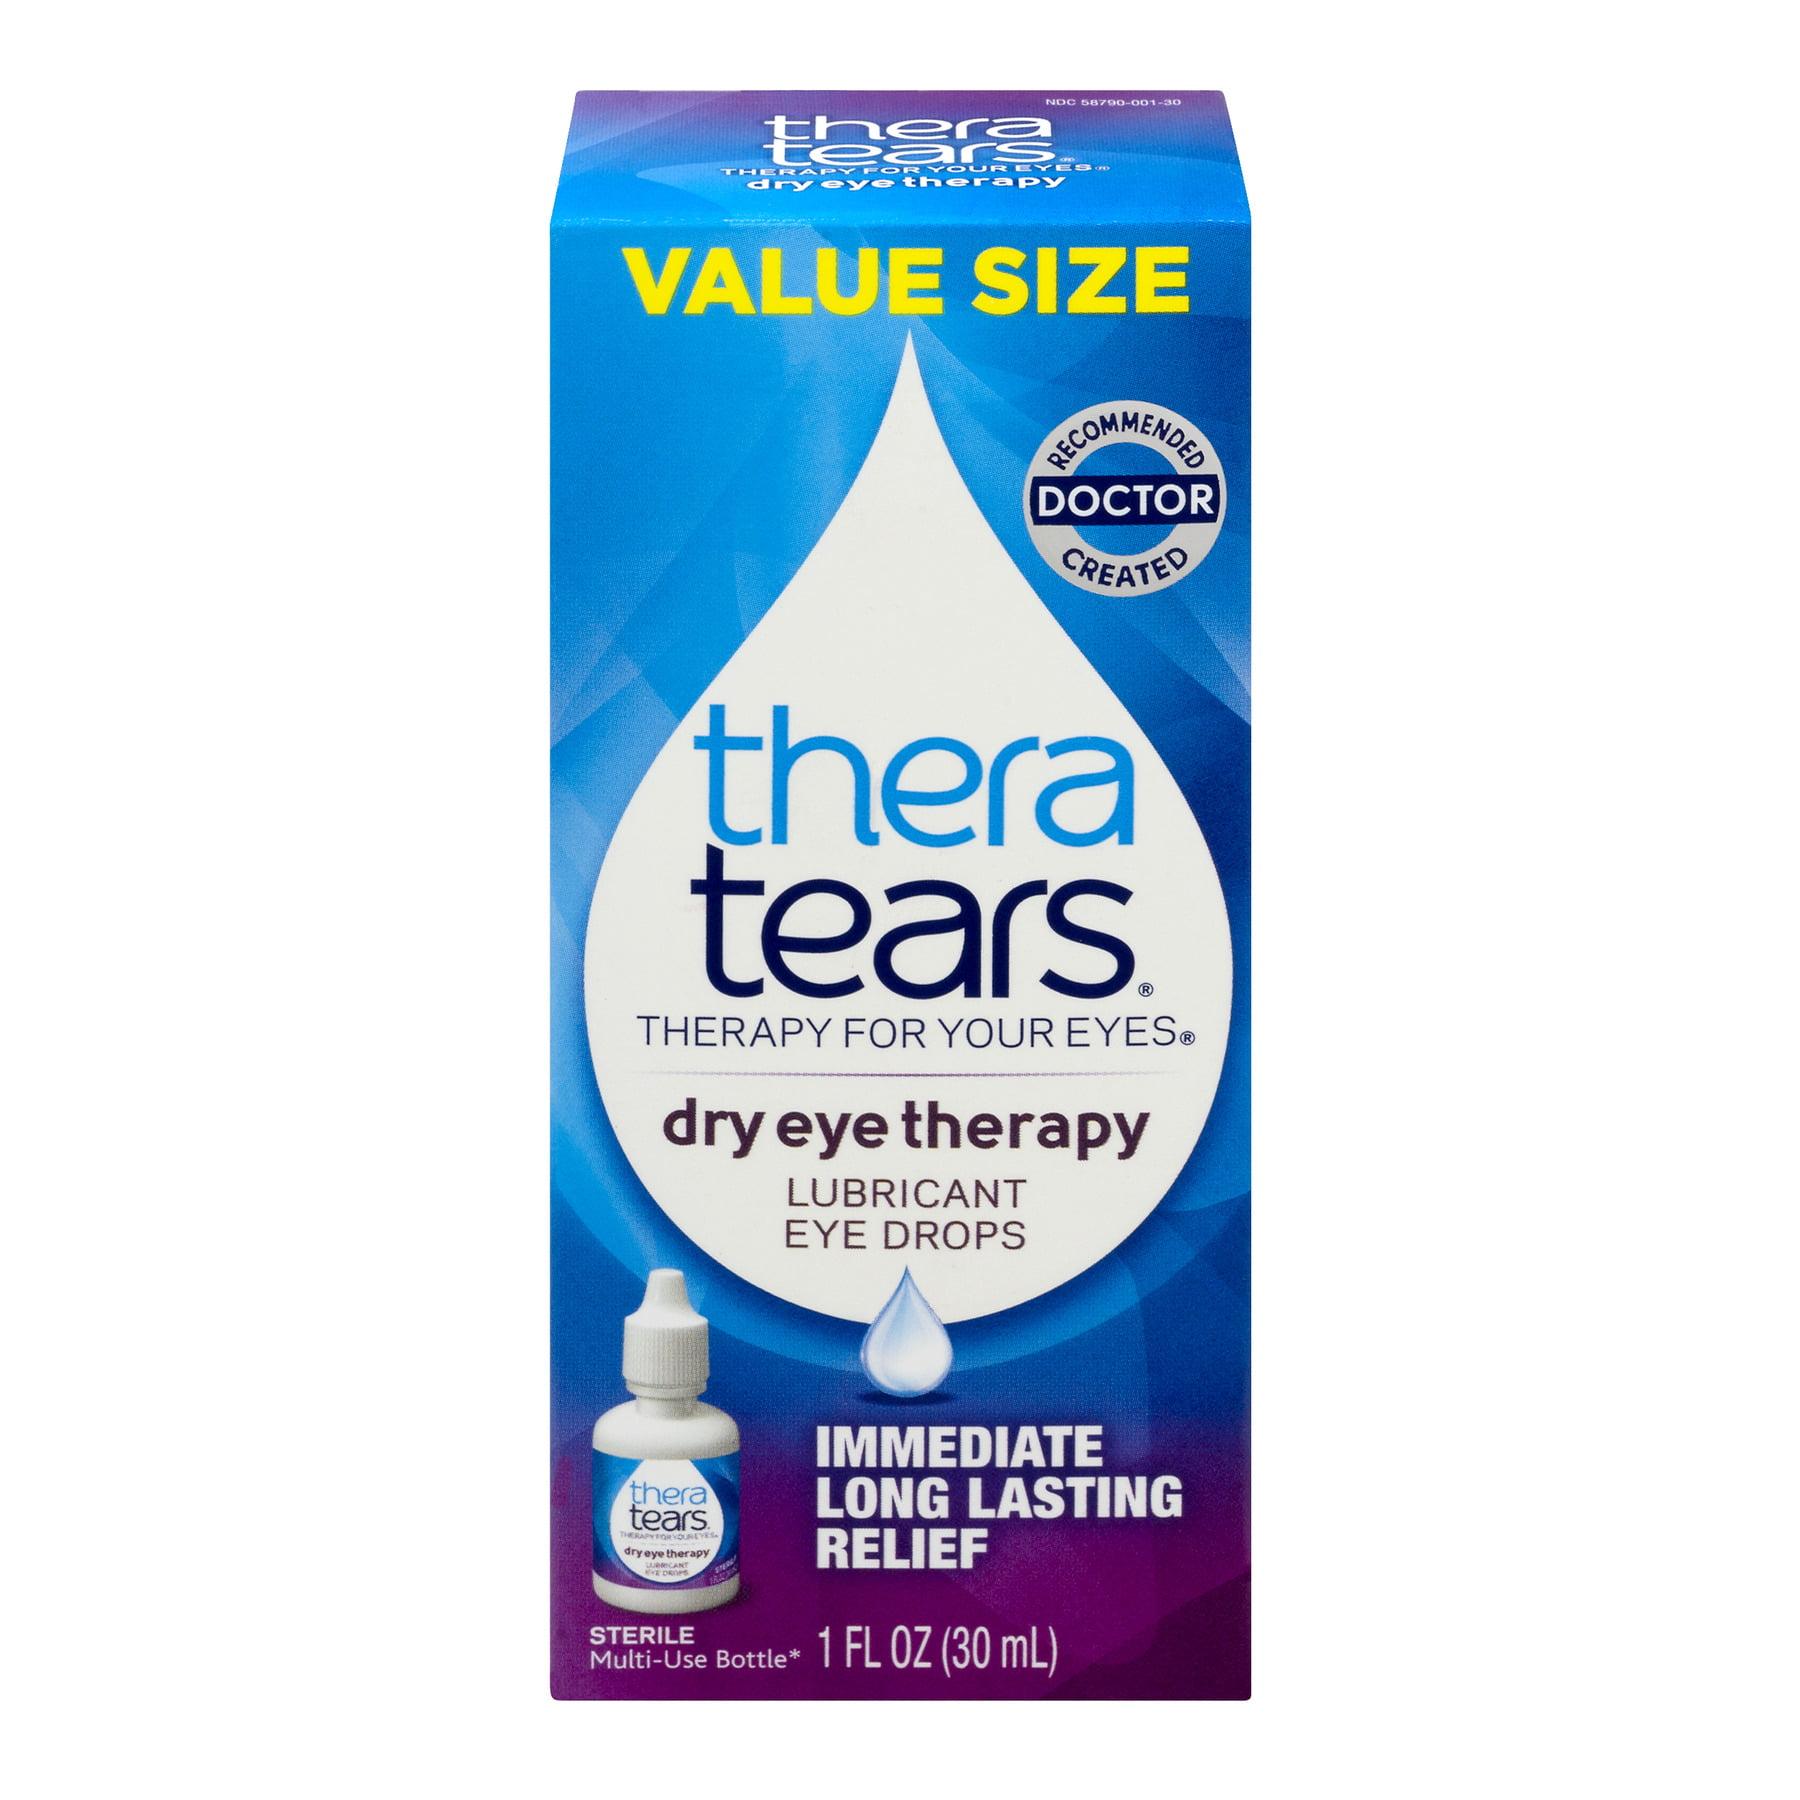 TheraTears Dry Eye Therapy Eye Drops, 1.0 FL OZ